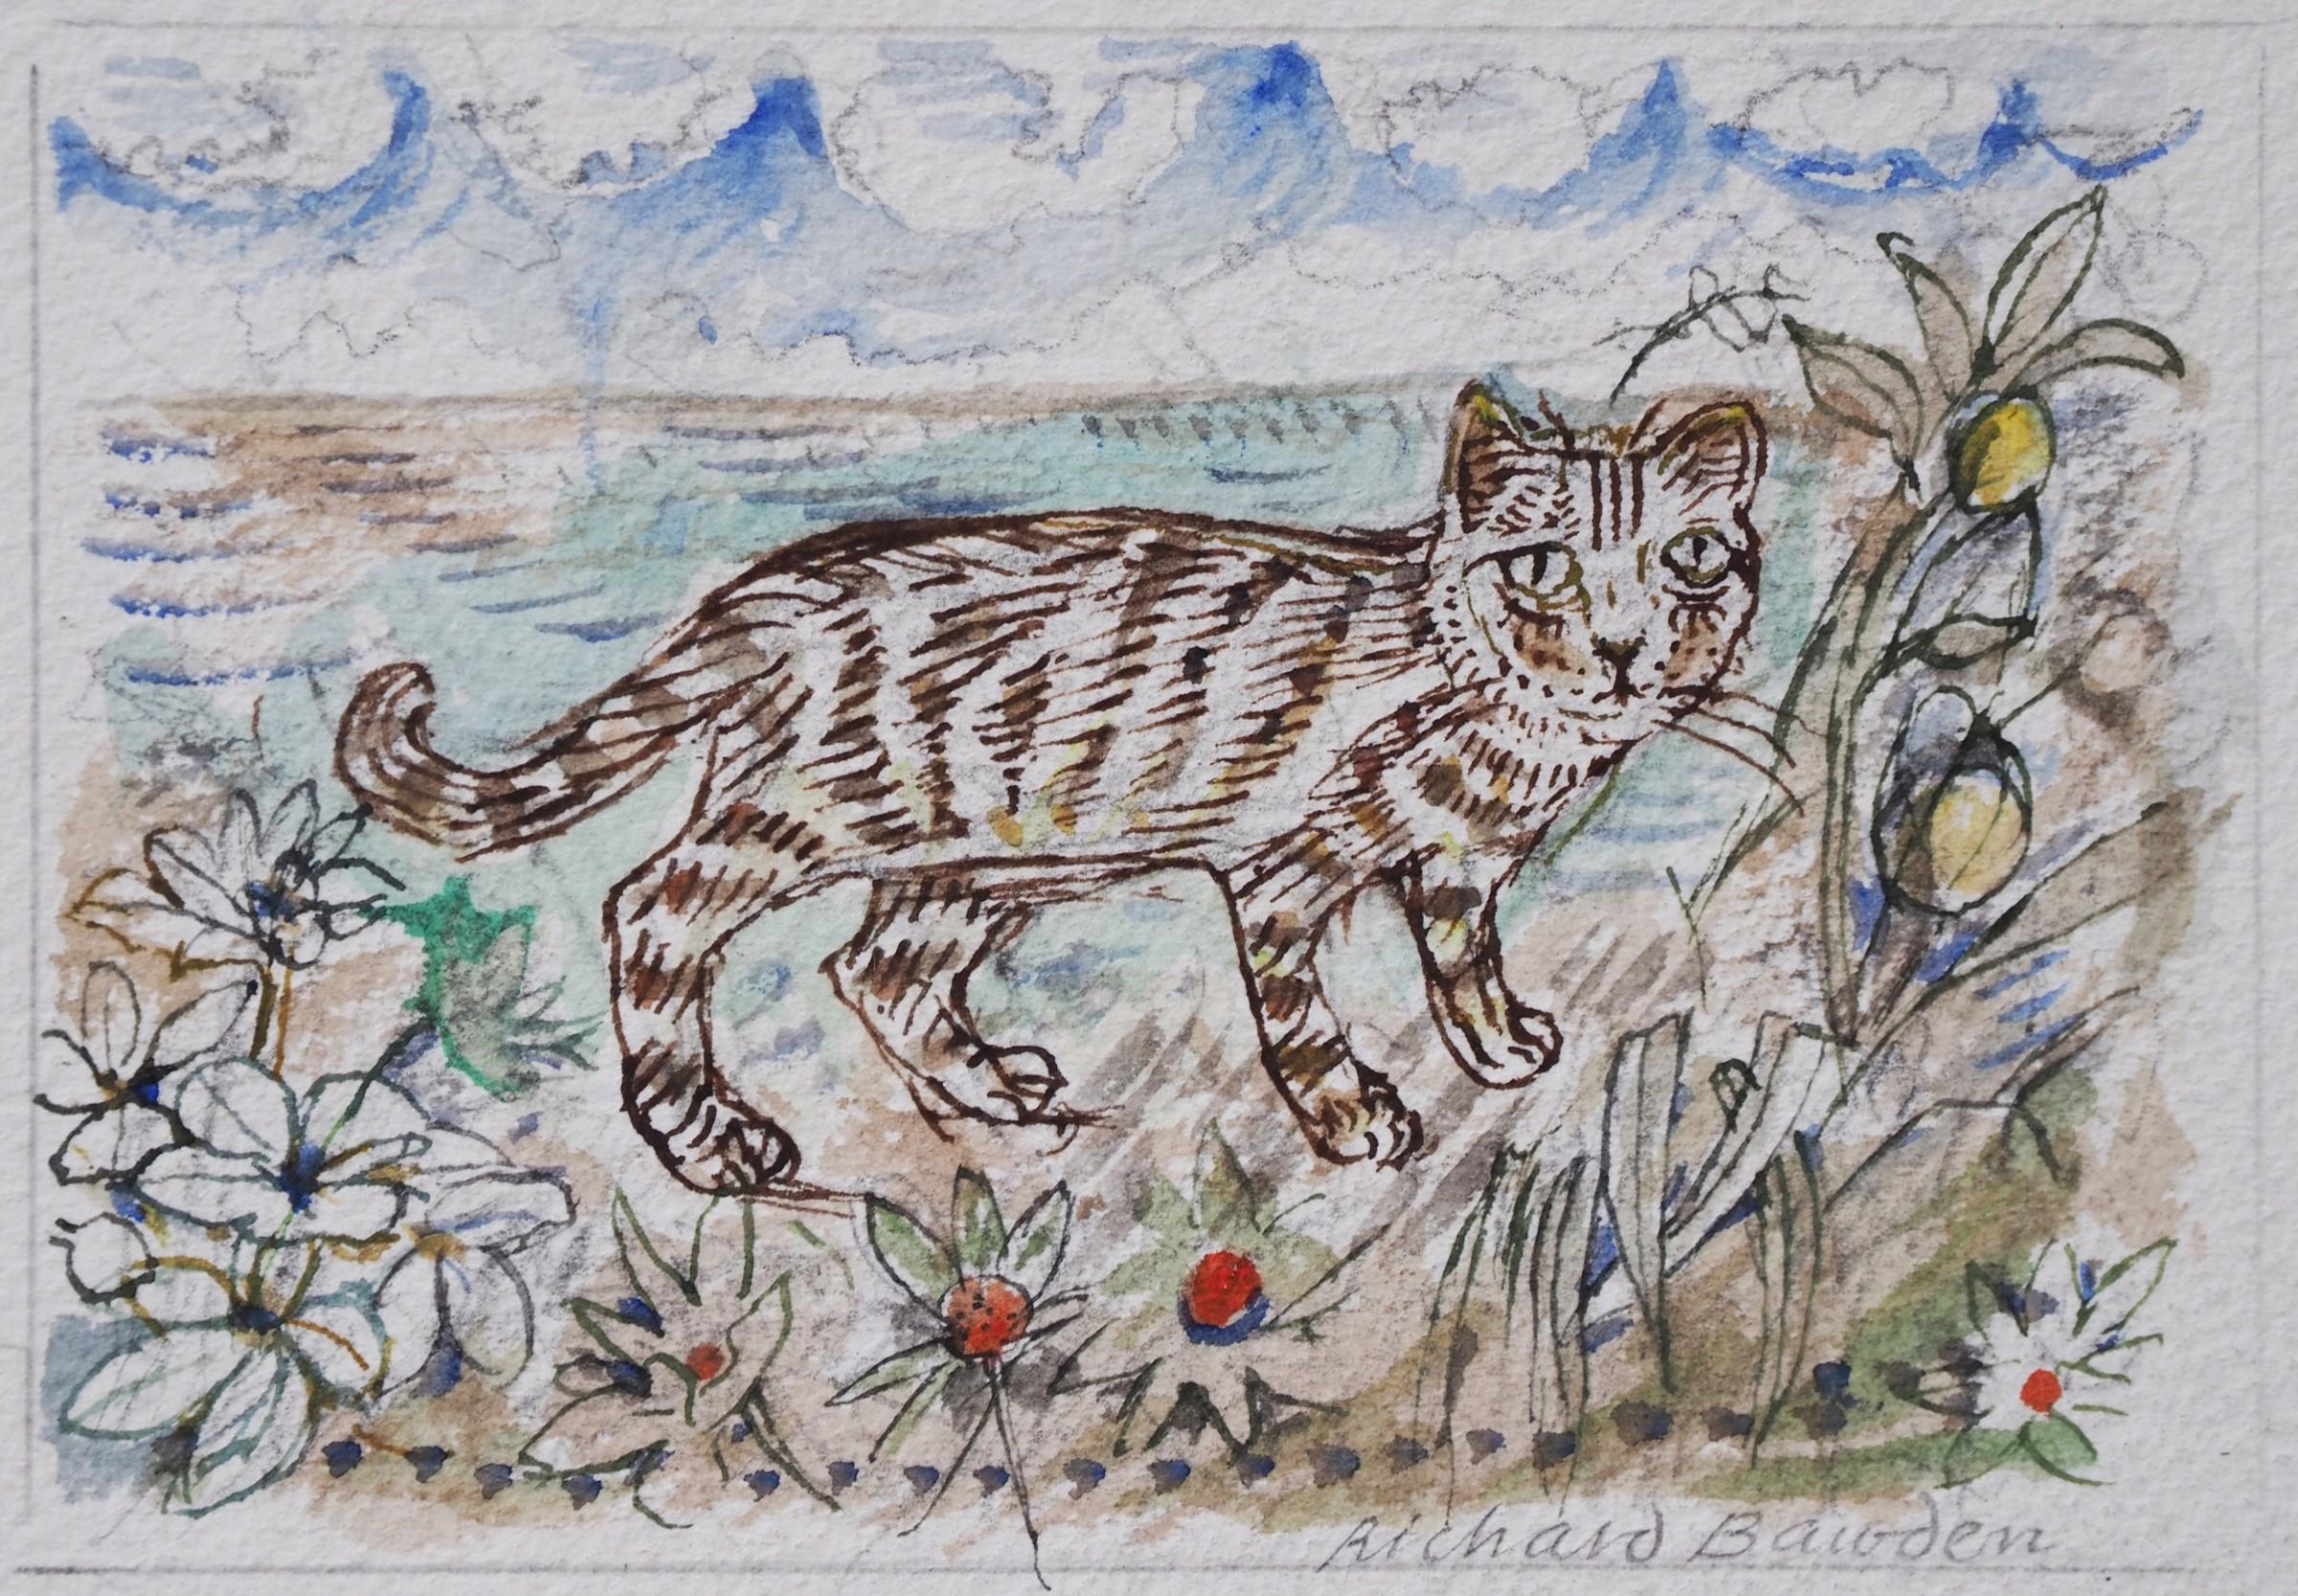 "<span class=""link fancybox-details-link""><a href=""/artists/38-richard-bawden/works/12666-richard-bawden-big-cat/"">View Detail Page</a></span><div class=""artist""><span class=""artist""><strong>Richard Bawden</strong></span></div><div class=""title""><em>Big Cat</em></div><div class=""medium"">watercolour</div><div class=""dimensions"">Artwork: 14 x 10cm</div><div class=""price"">£350.00</div>"